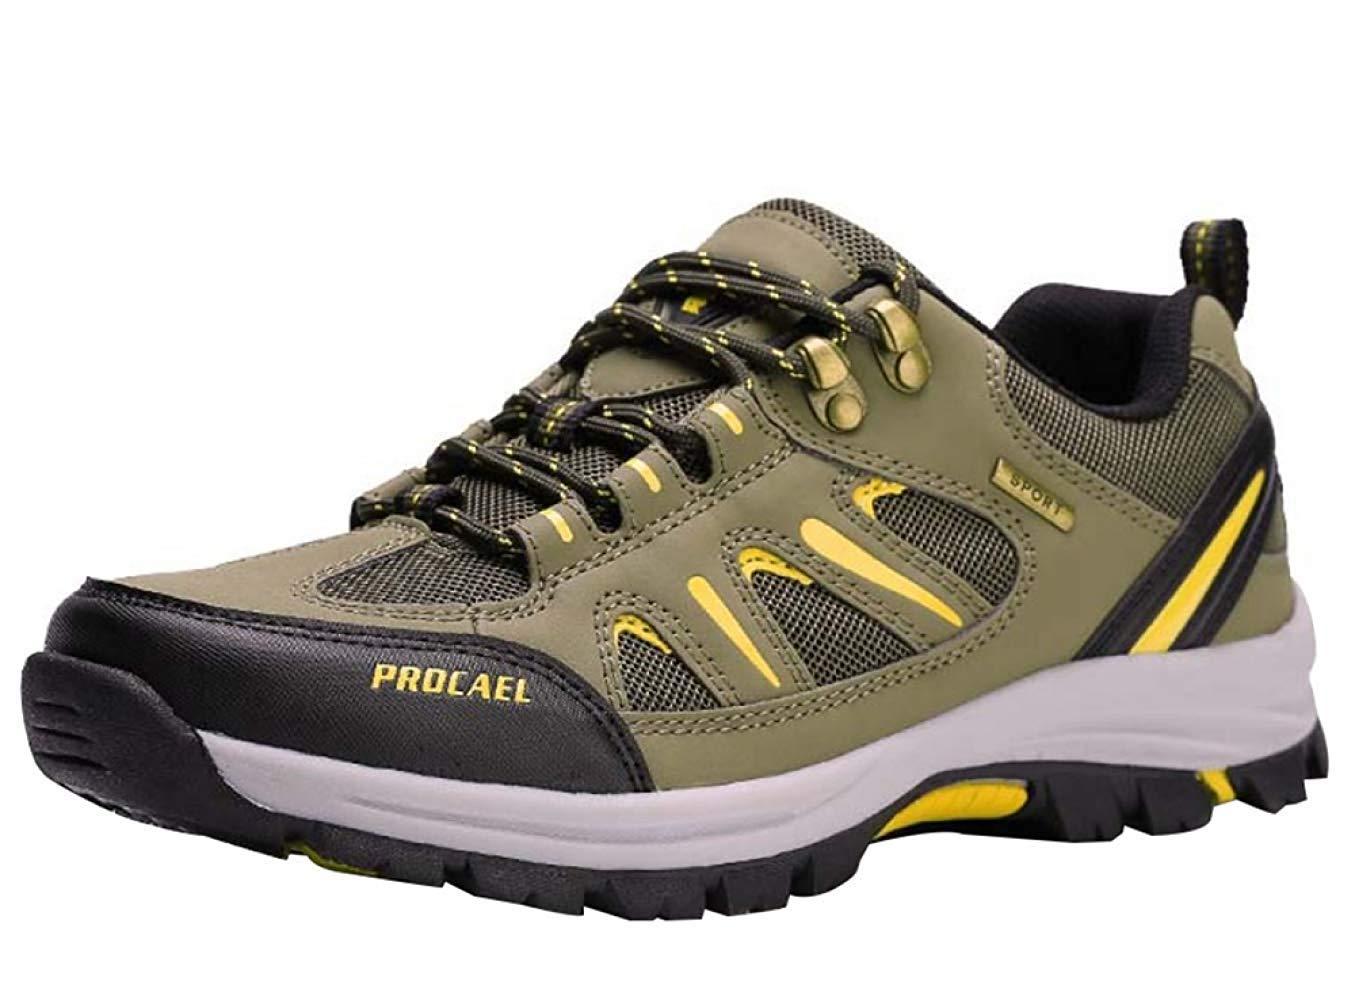 HhGold Männer Wanderschuhe Stiefel Leder Wanderschuhe Turnschuhe Für Outdoor Trekking Training Beiläufige Arbeit (Farbe : 1, Größe : 40EU)